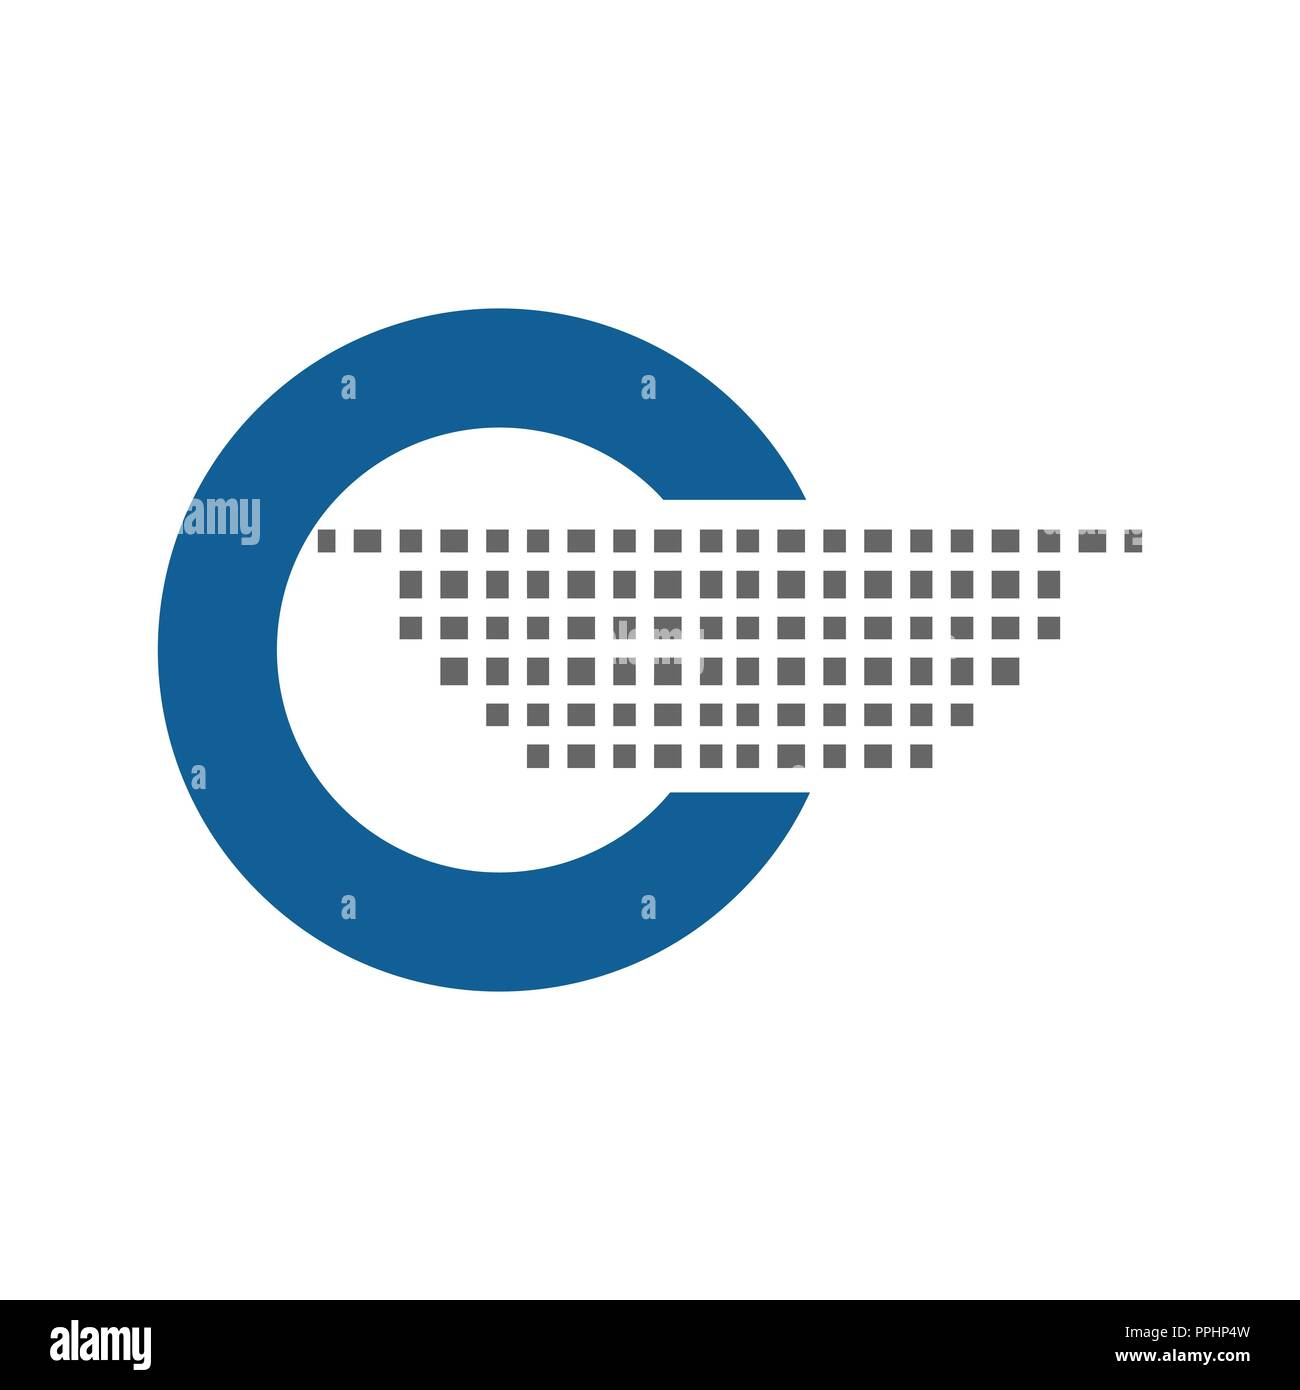 Blue Round Circle Logo Vector Icon - Stock Image